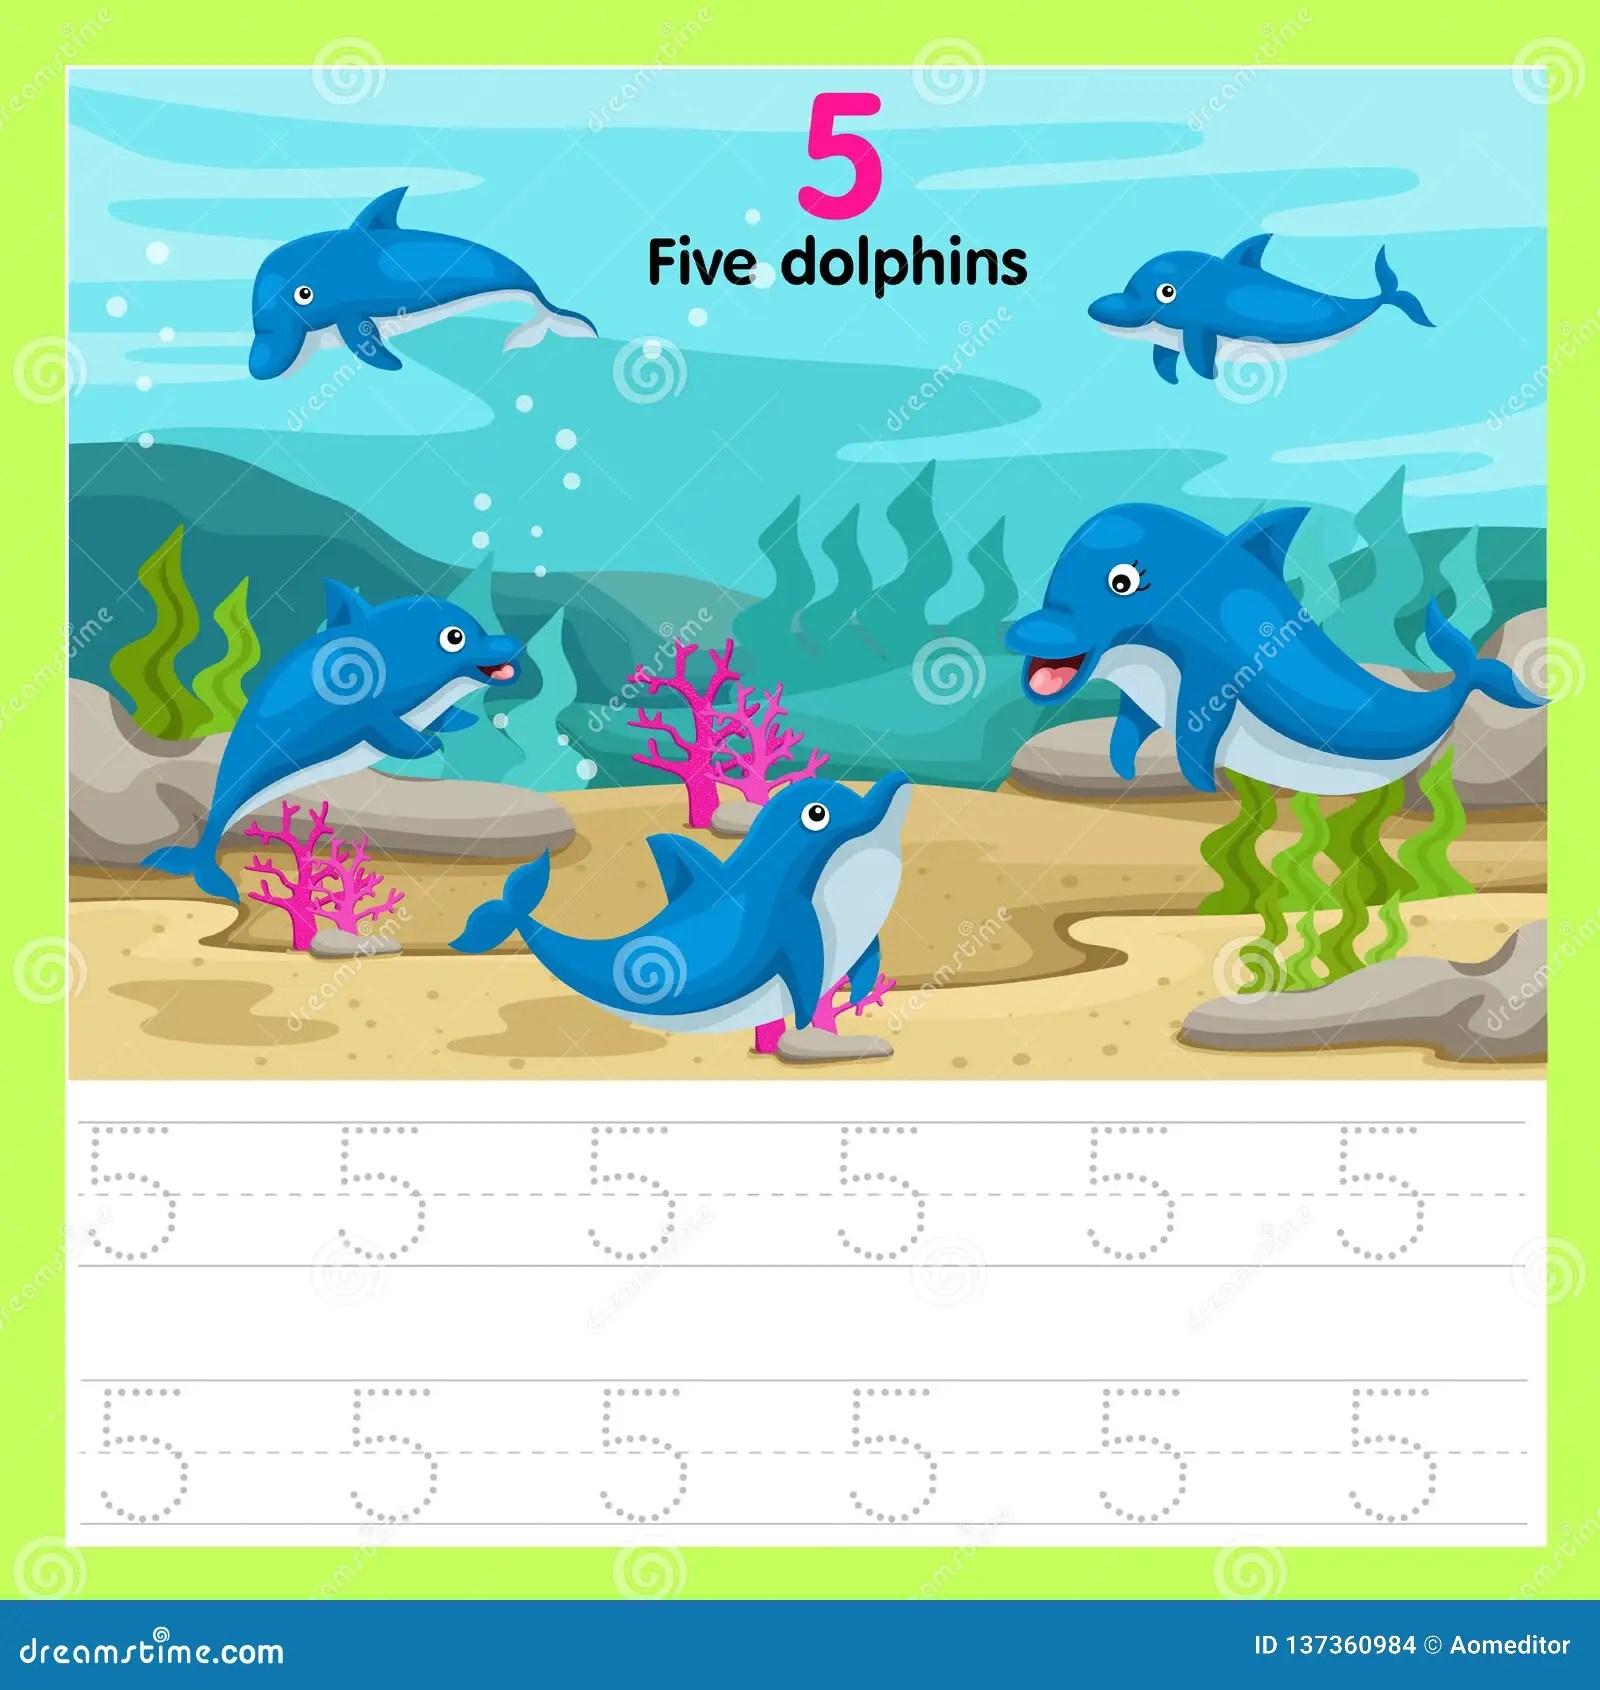 Illustrator Of Worksheet Five Dolphins Stock Vector